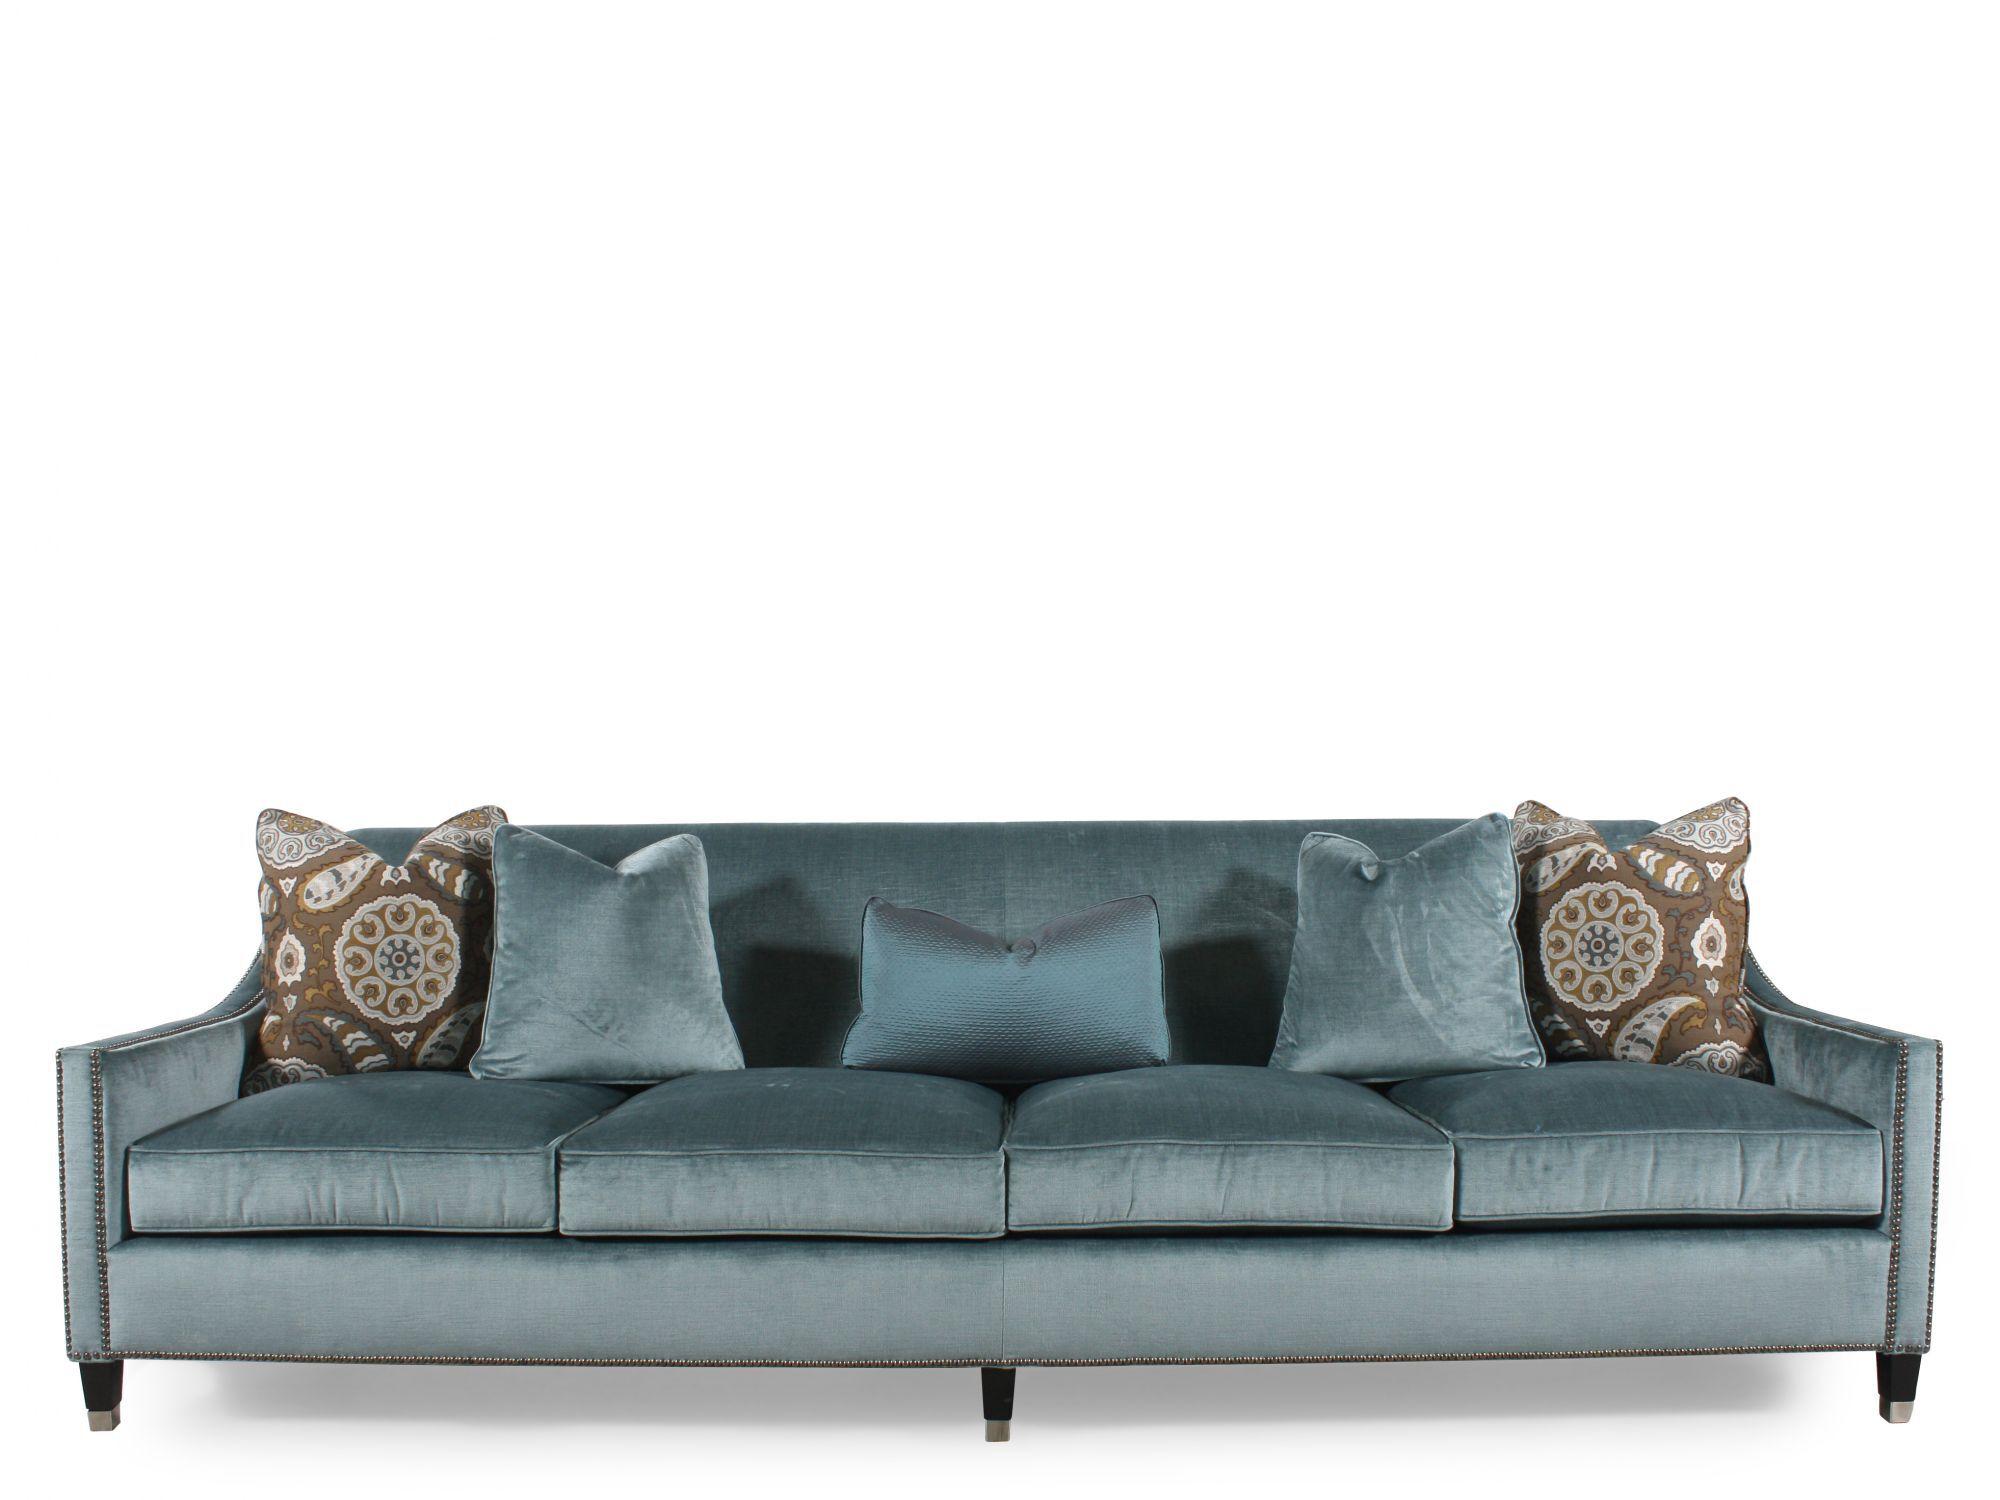 bernhardt sofa price list wood frame leather sofas http www product